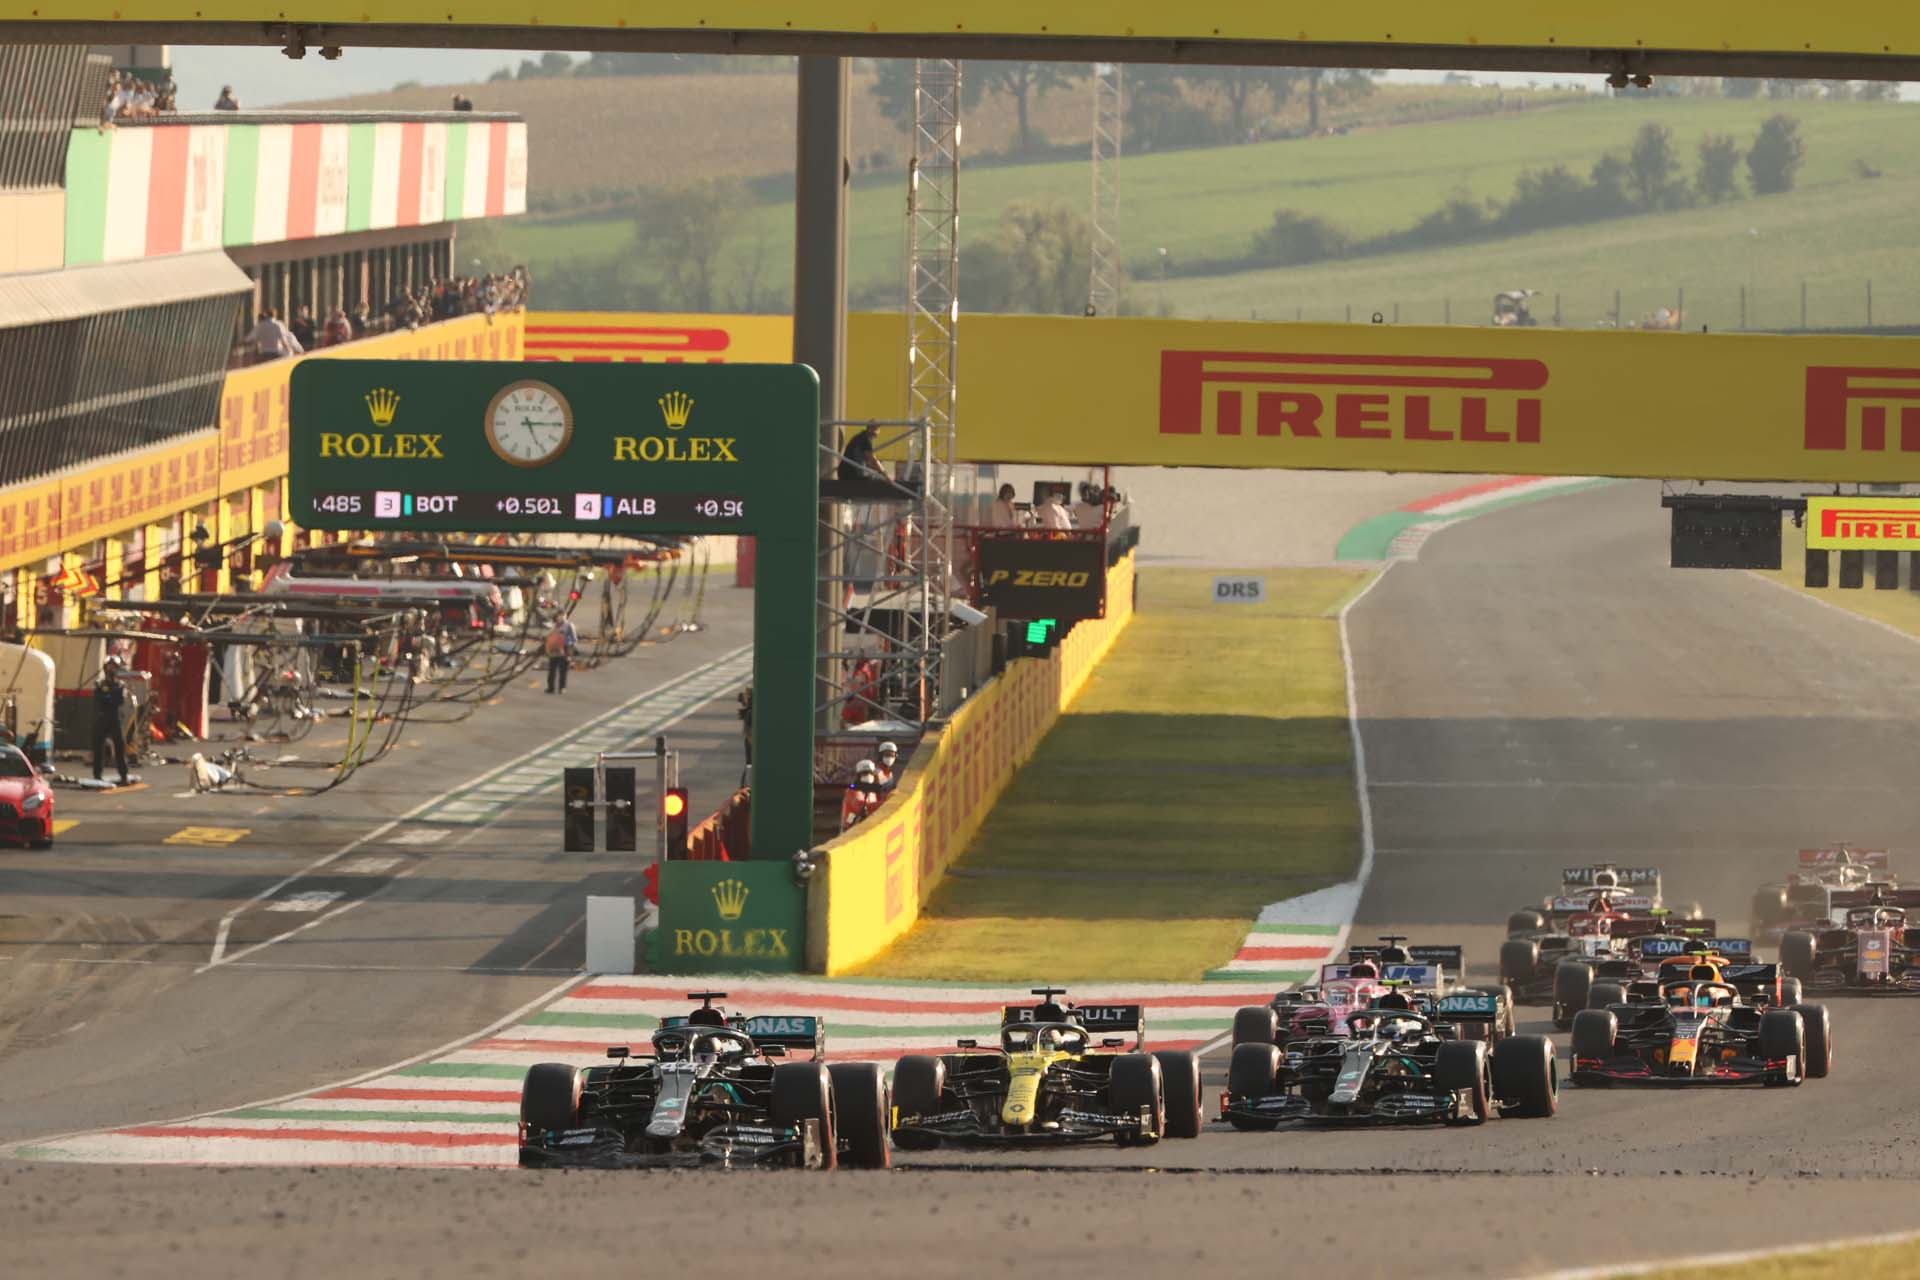 2020 Tuscan Grand Prix, Sunday - Wolfgang Wilhelm